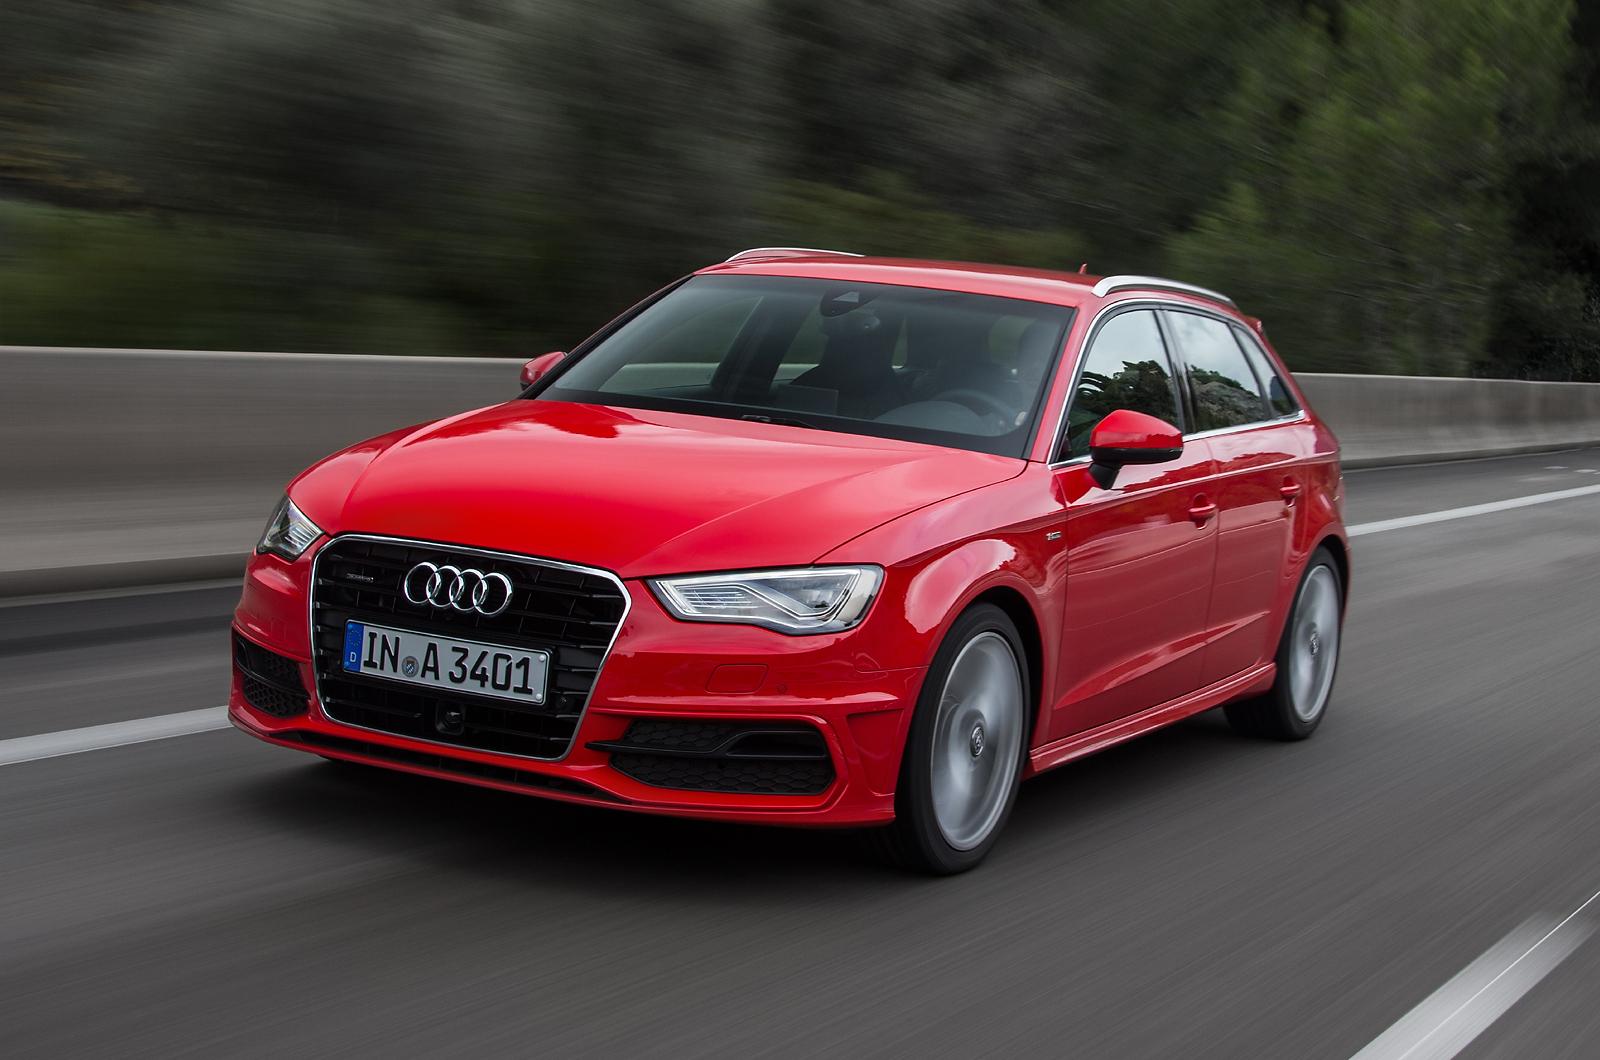 Kekurangan Audi A3 1.8 Top Model Tahun Ini